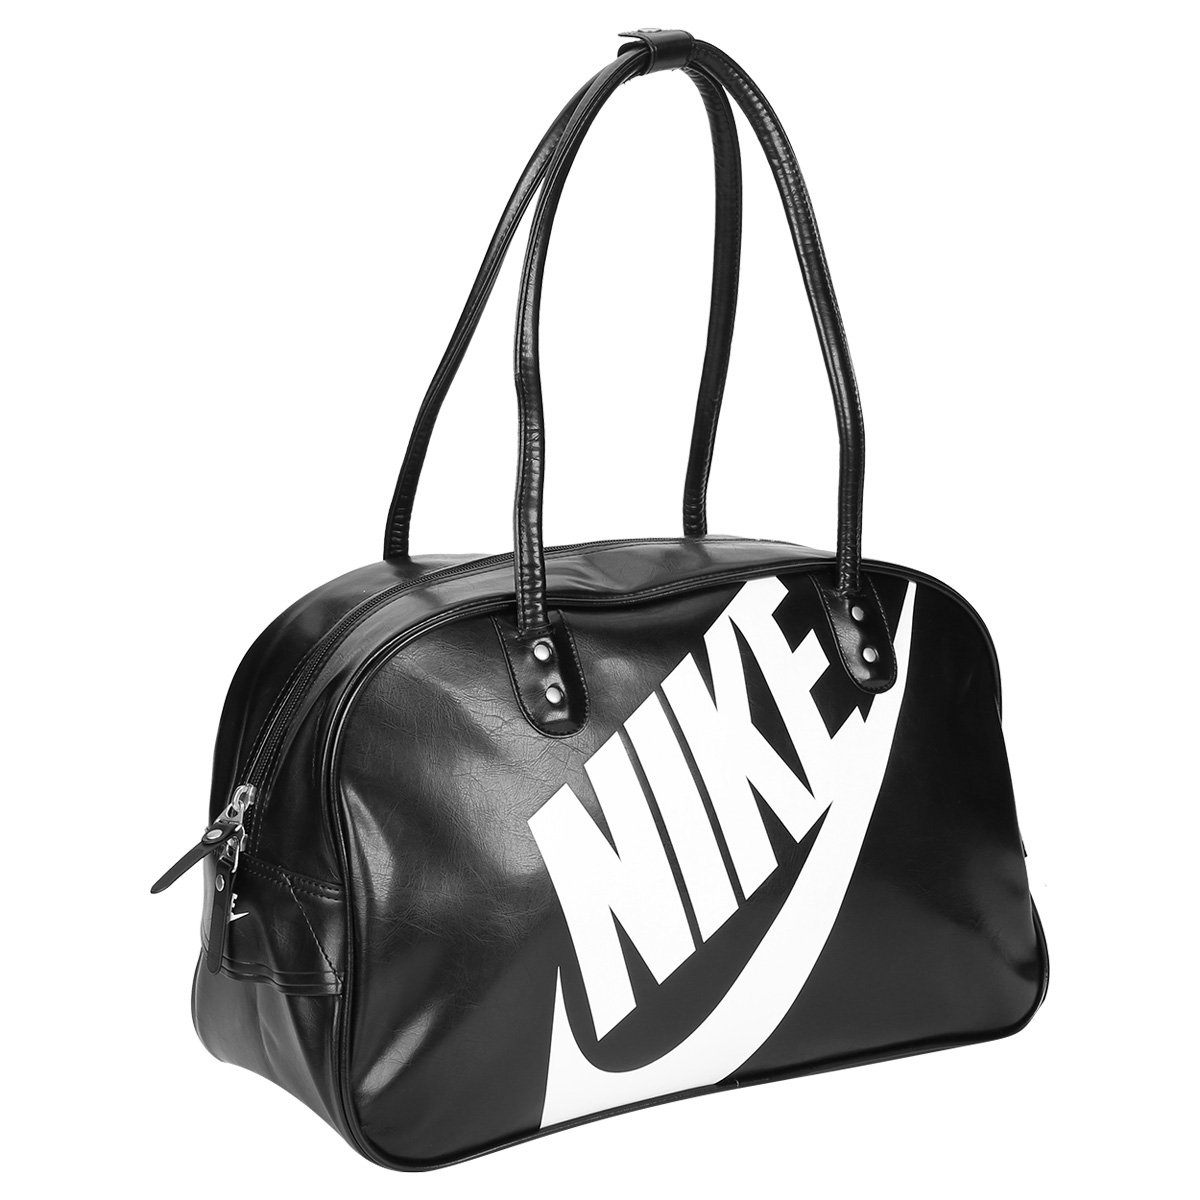 Agora Shoulder Si Nike Netshoes Club Bolsa Compre Heritage qgYOnwt fa35e82dd56